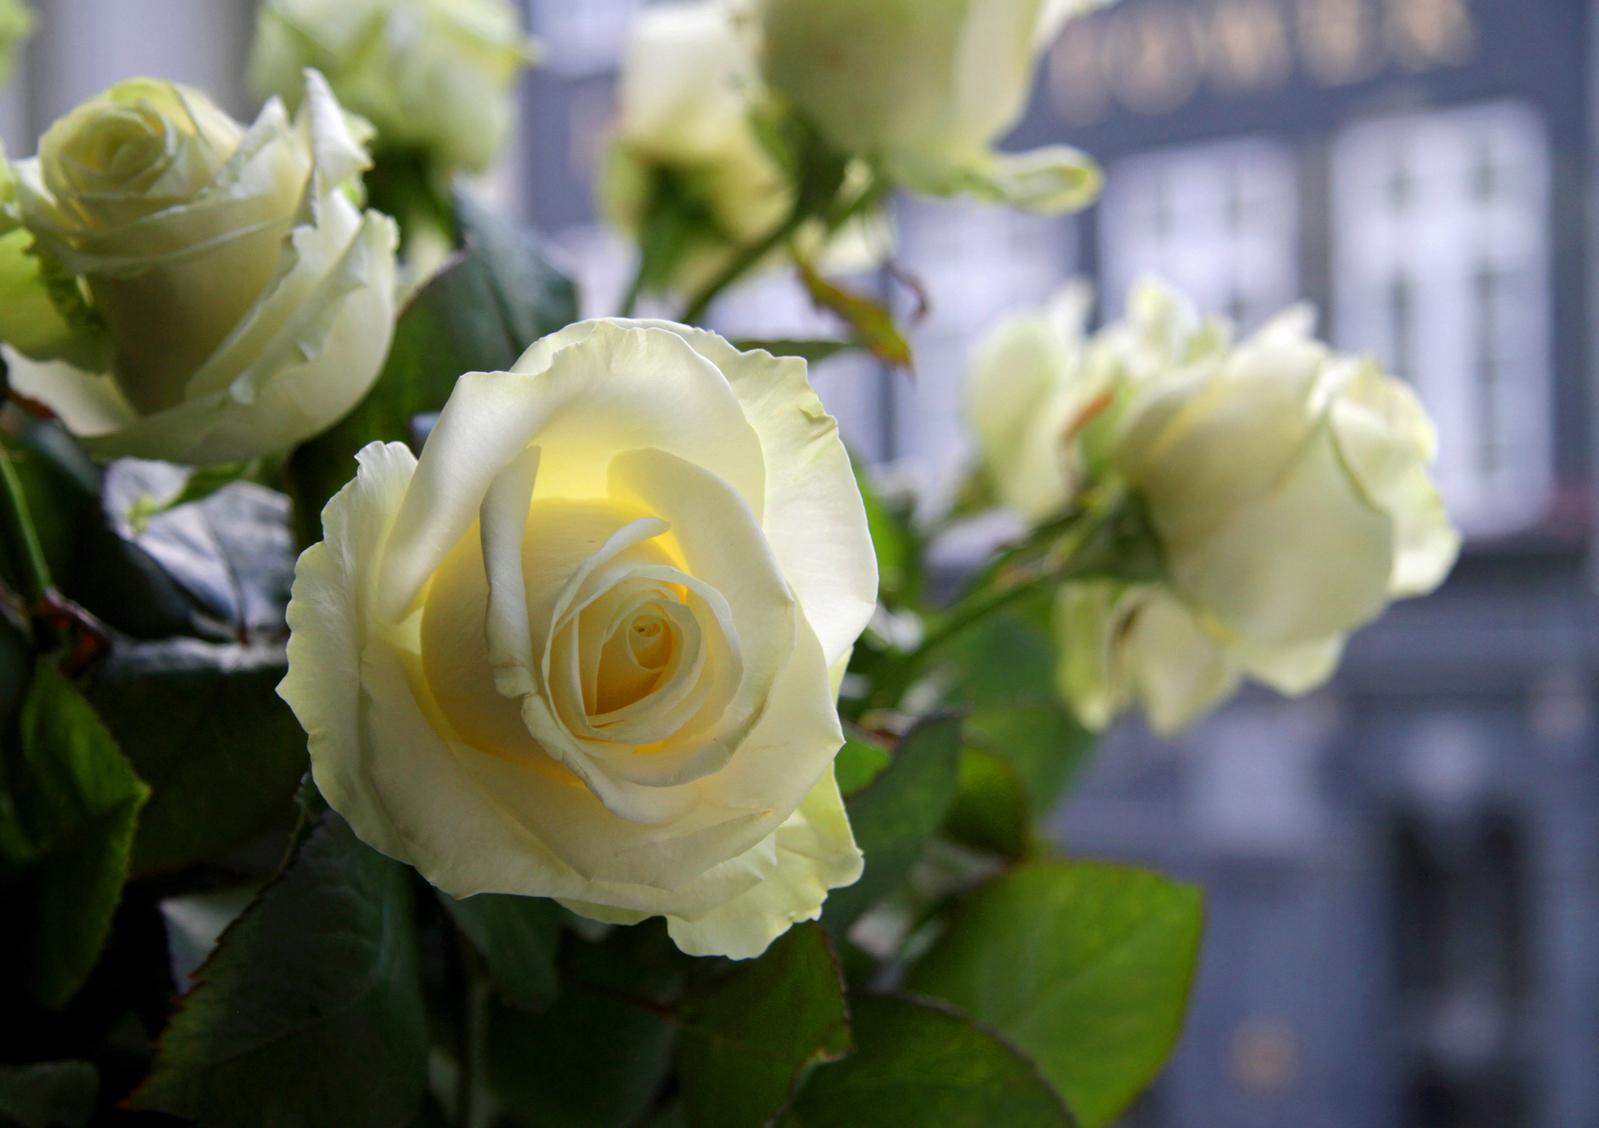 flowers-on-the-windowsill-1633182-1599x1129